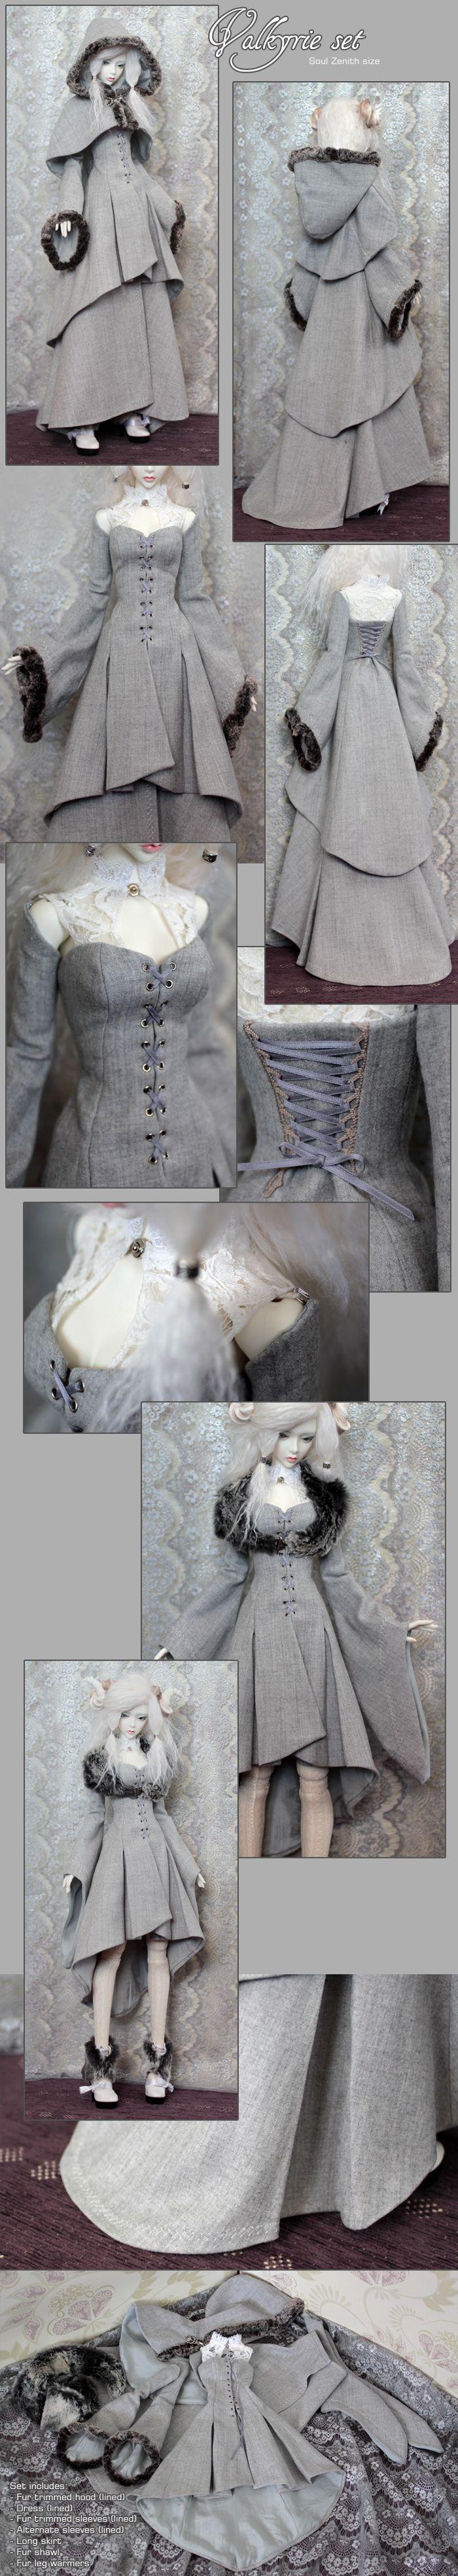 Sigrun's Valkyrie Set by *yenna-photo on deviantART - Very Cool